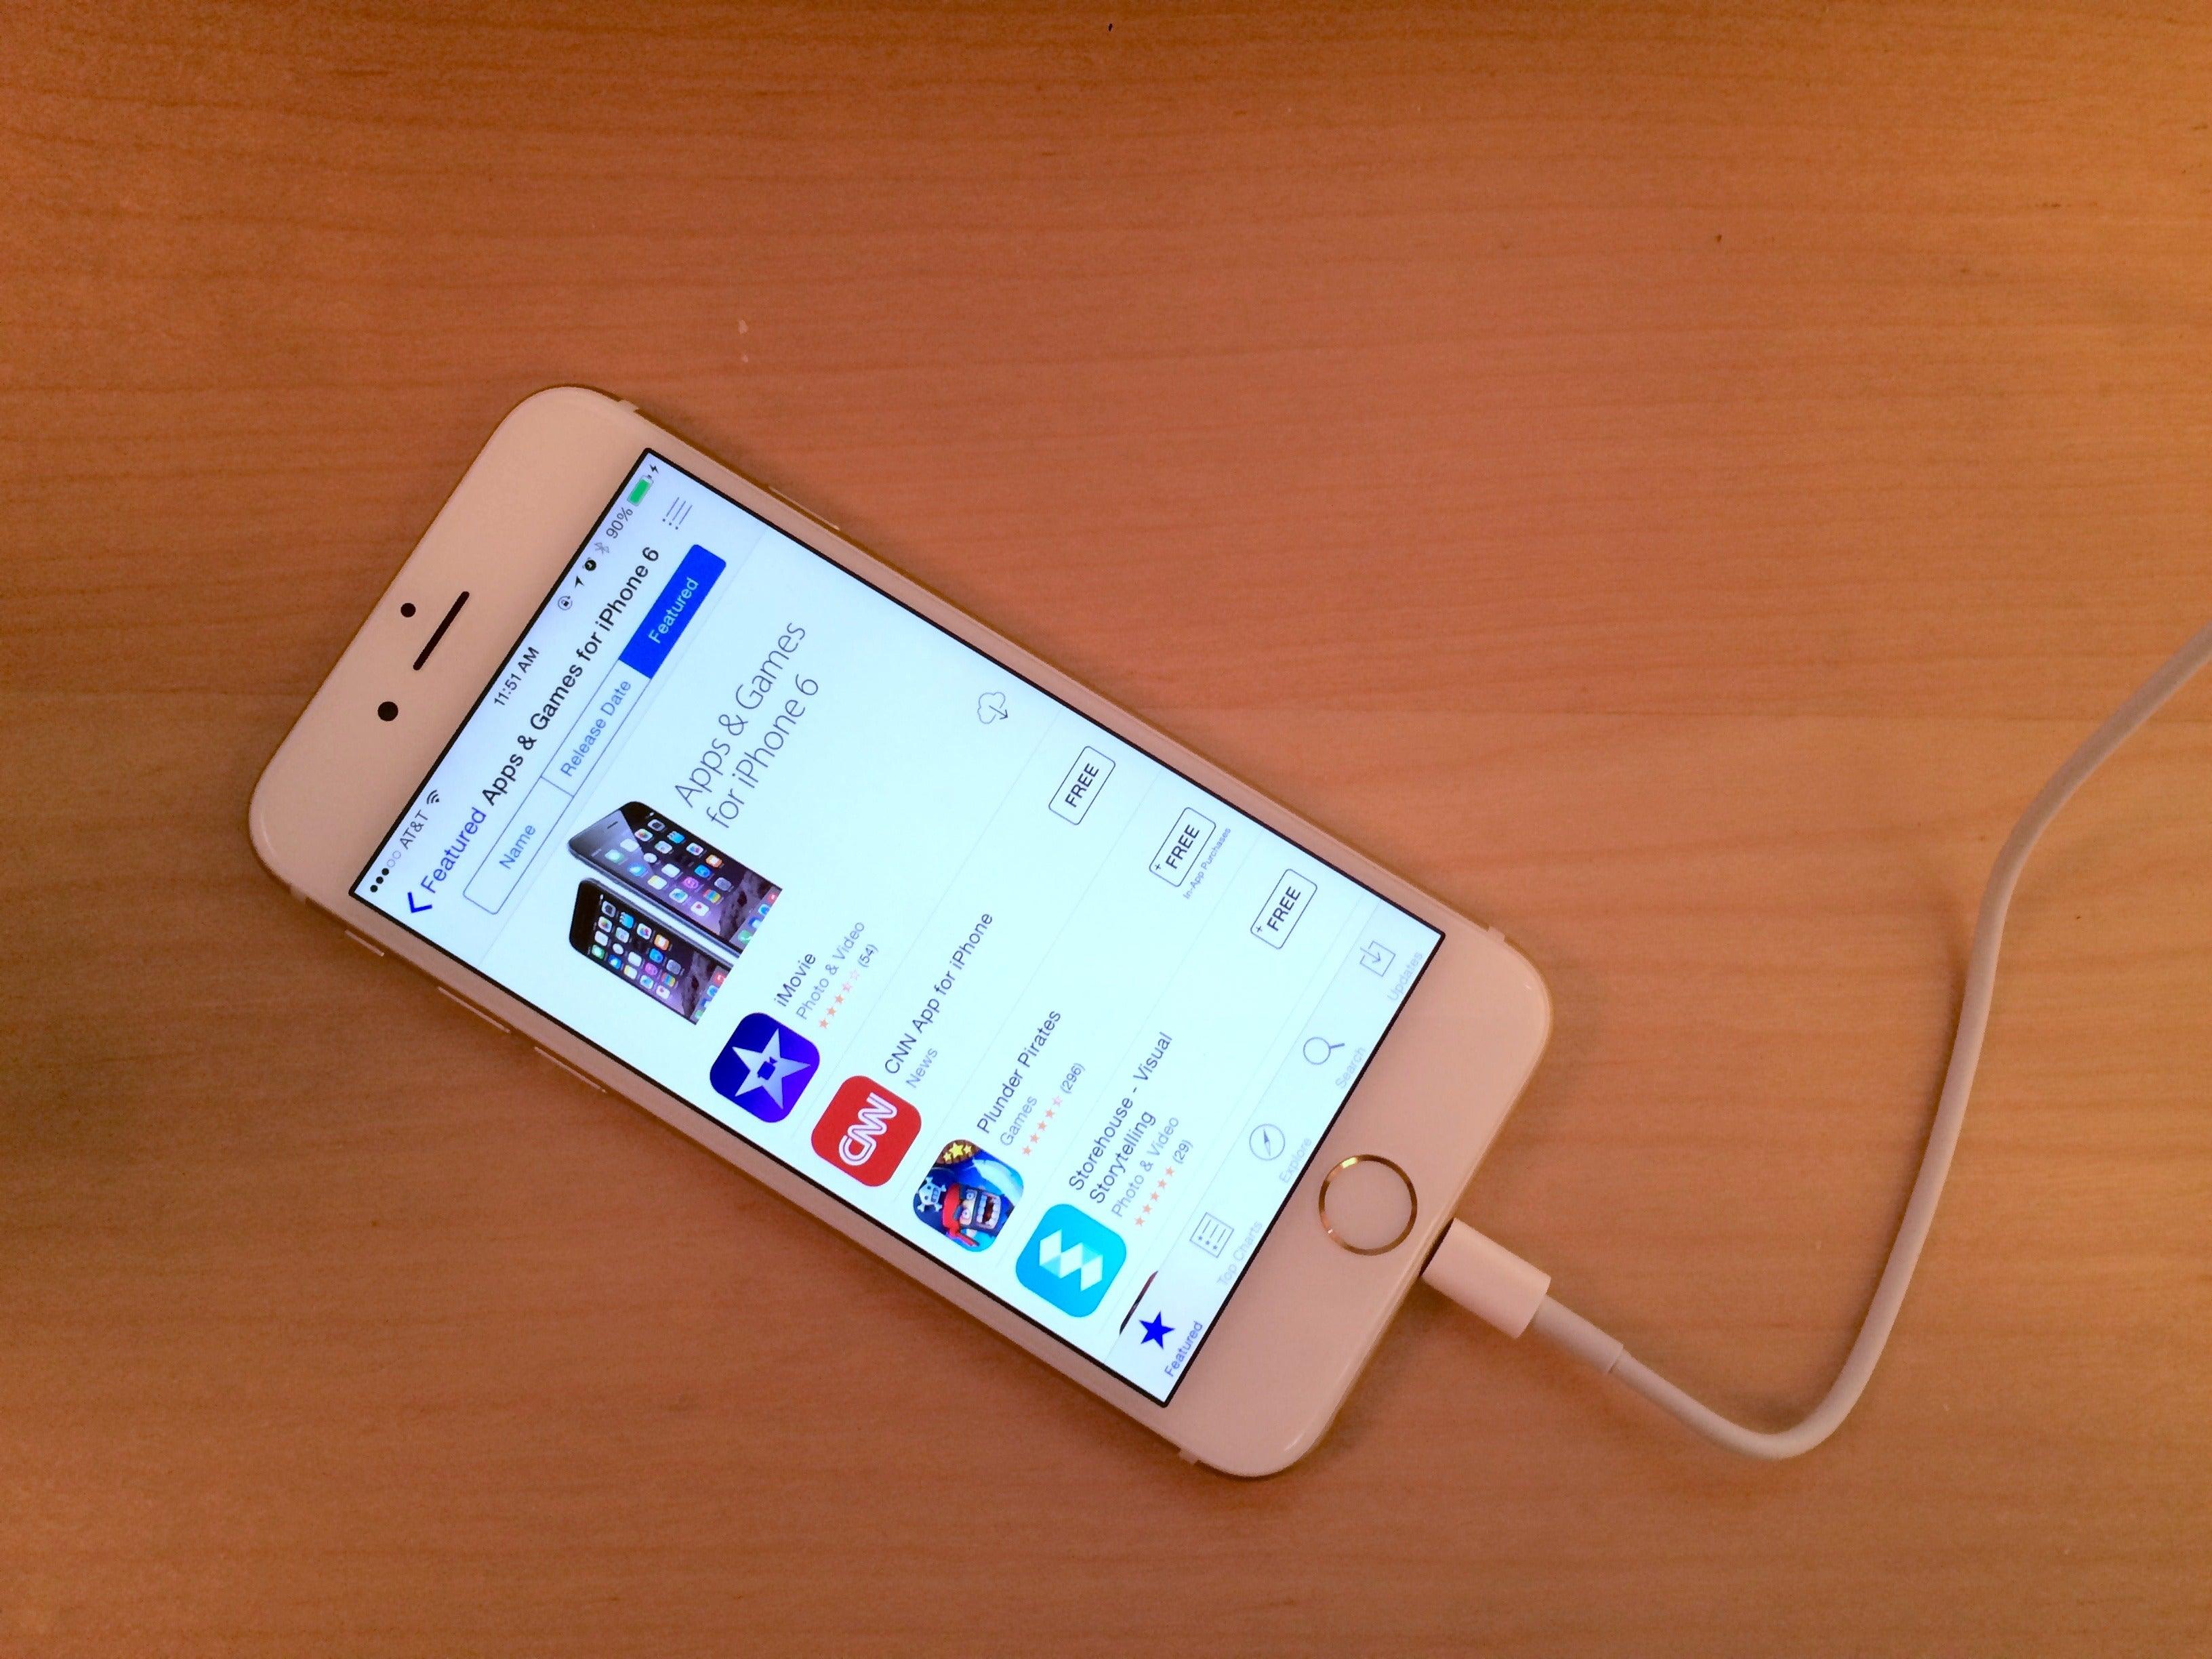 Iphone 6 - Iphone 6 11